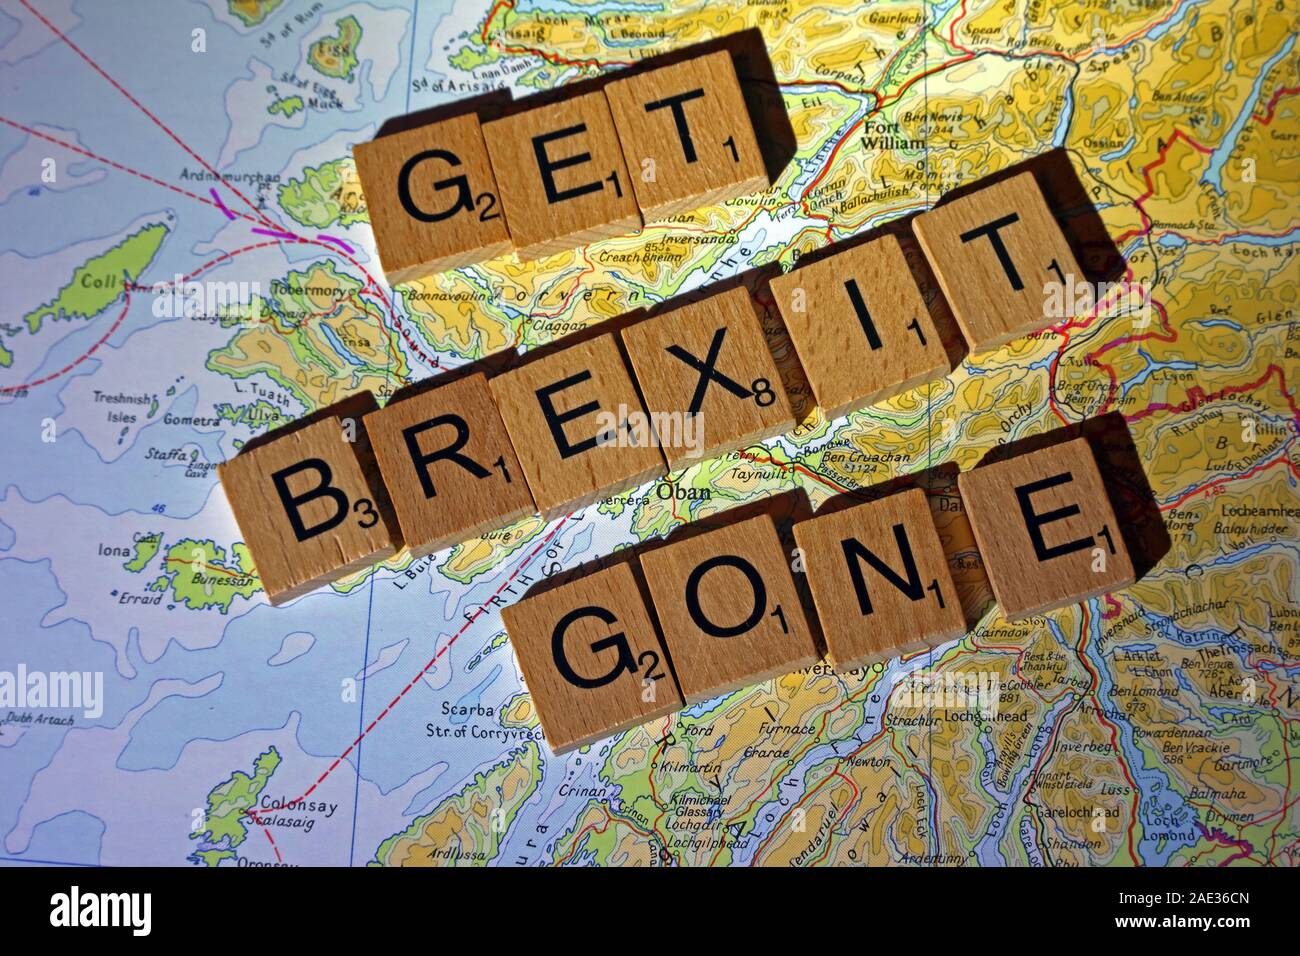 GotonySmith,HotpixUK,@HotpixUK,Westminster,party,polls,Dec 2019,GoTonySmith,December 2019,UK,polling,Westminster election,election,parliament,politics,winter,2019,political,government,scrabble letters,letters,letters on map,map,letters on a map,atlas,Scrabble letters on a UK map - General Election,elections,party political,leaders,parties,claims,doubts,promises,belief,Labour,Tory,Conservative,LibDem,Brexit,SNP,Plaid Cymru,Johnocchio